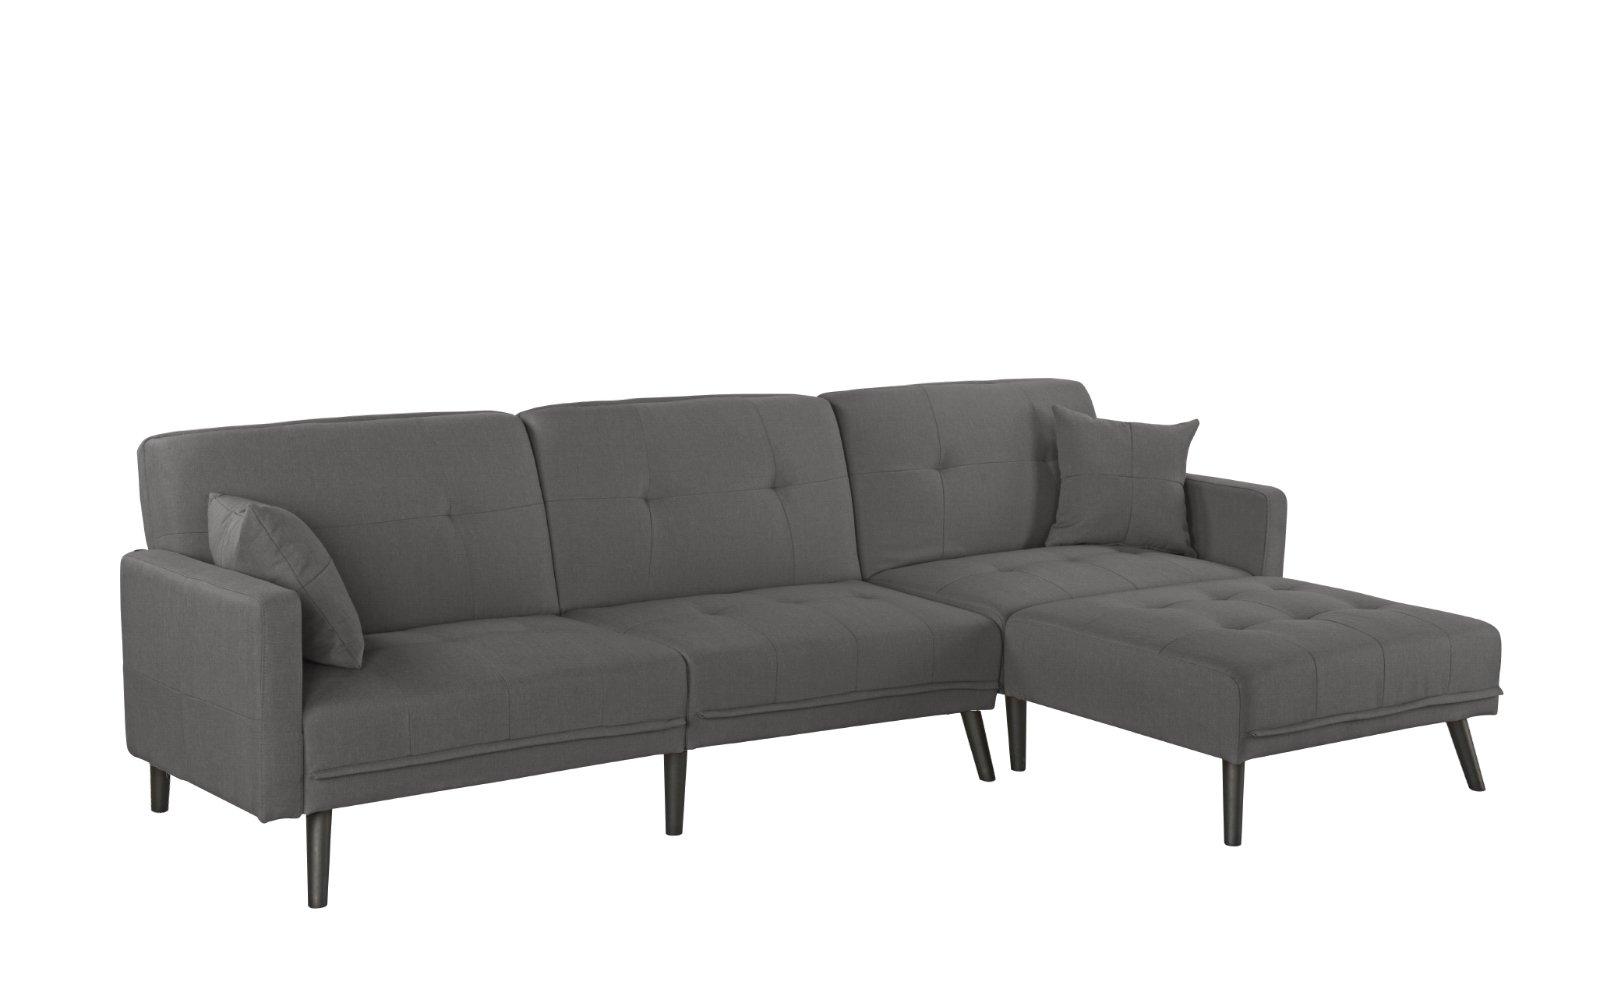 Mid Century Modern Sofa Sleeper | Mid Century Modern Sofa By La Z ...